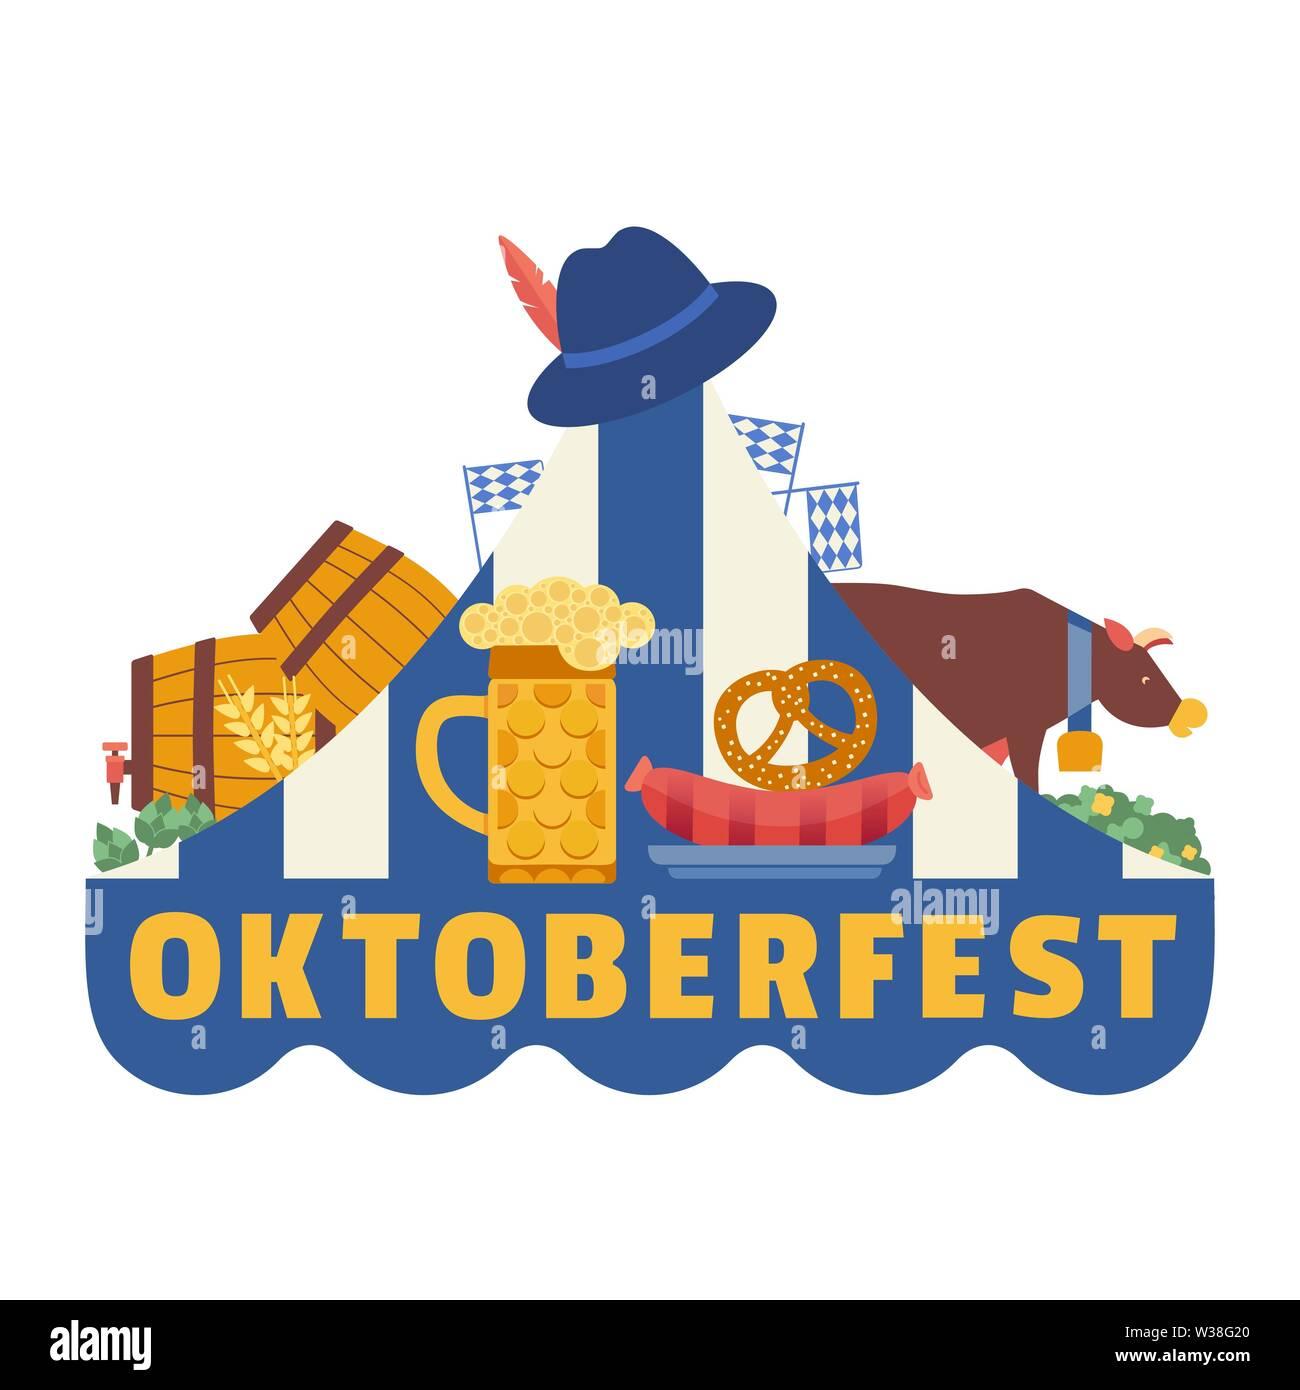 Hand drawn Oktoberfest flat color vector icon - Stock Image